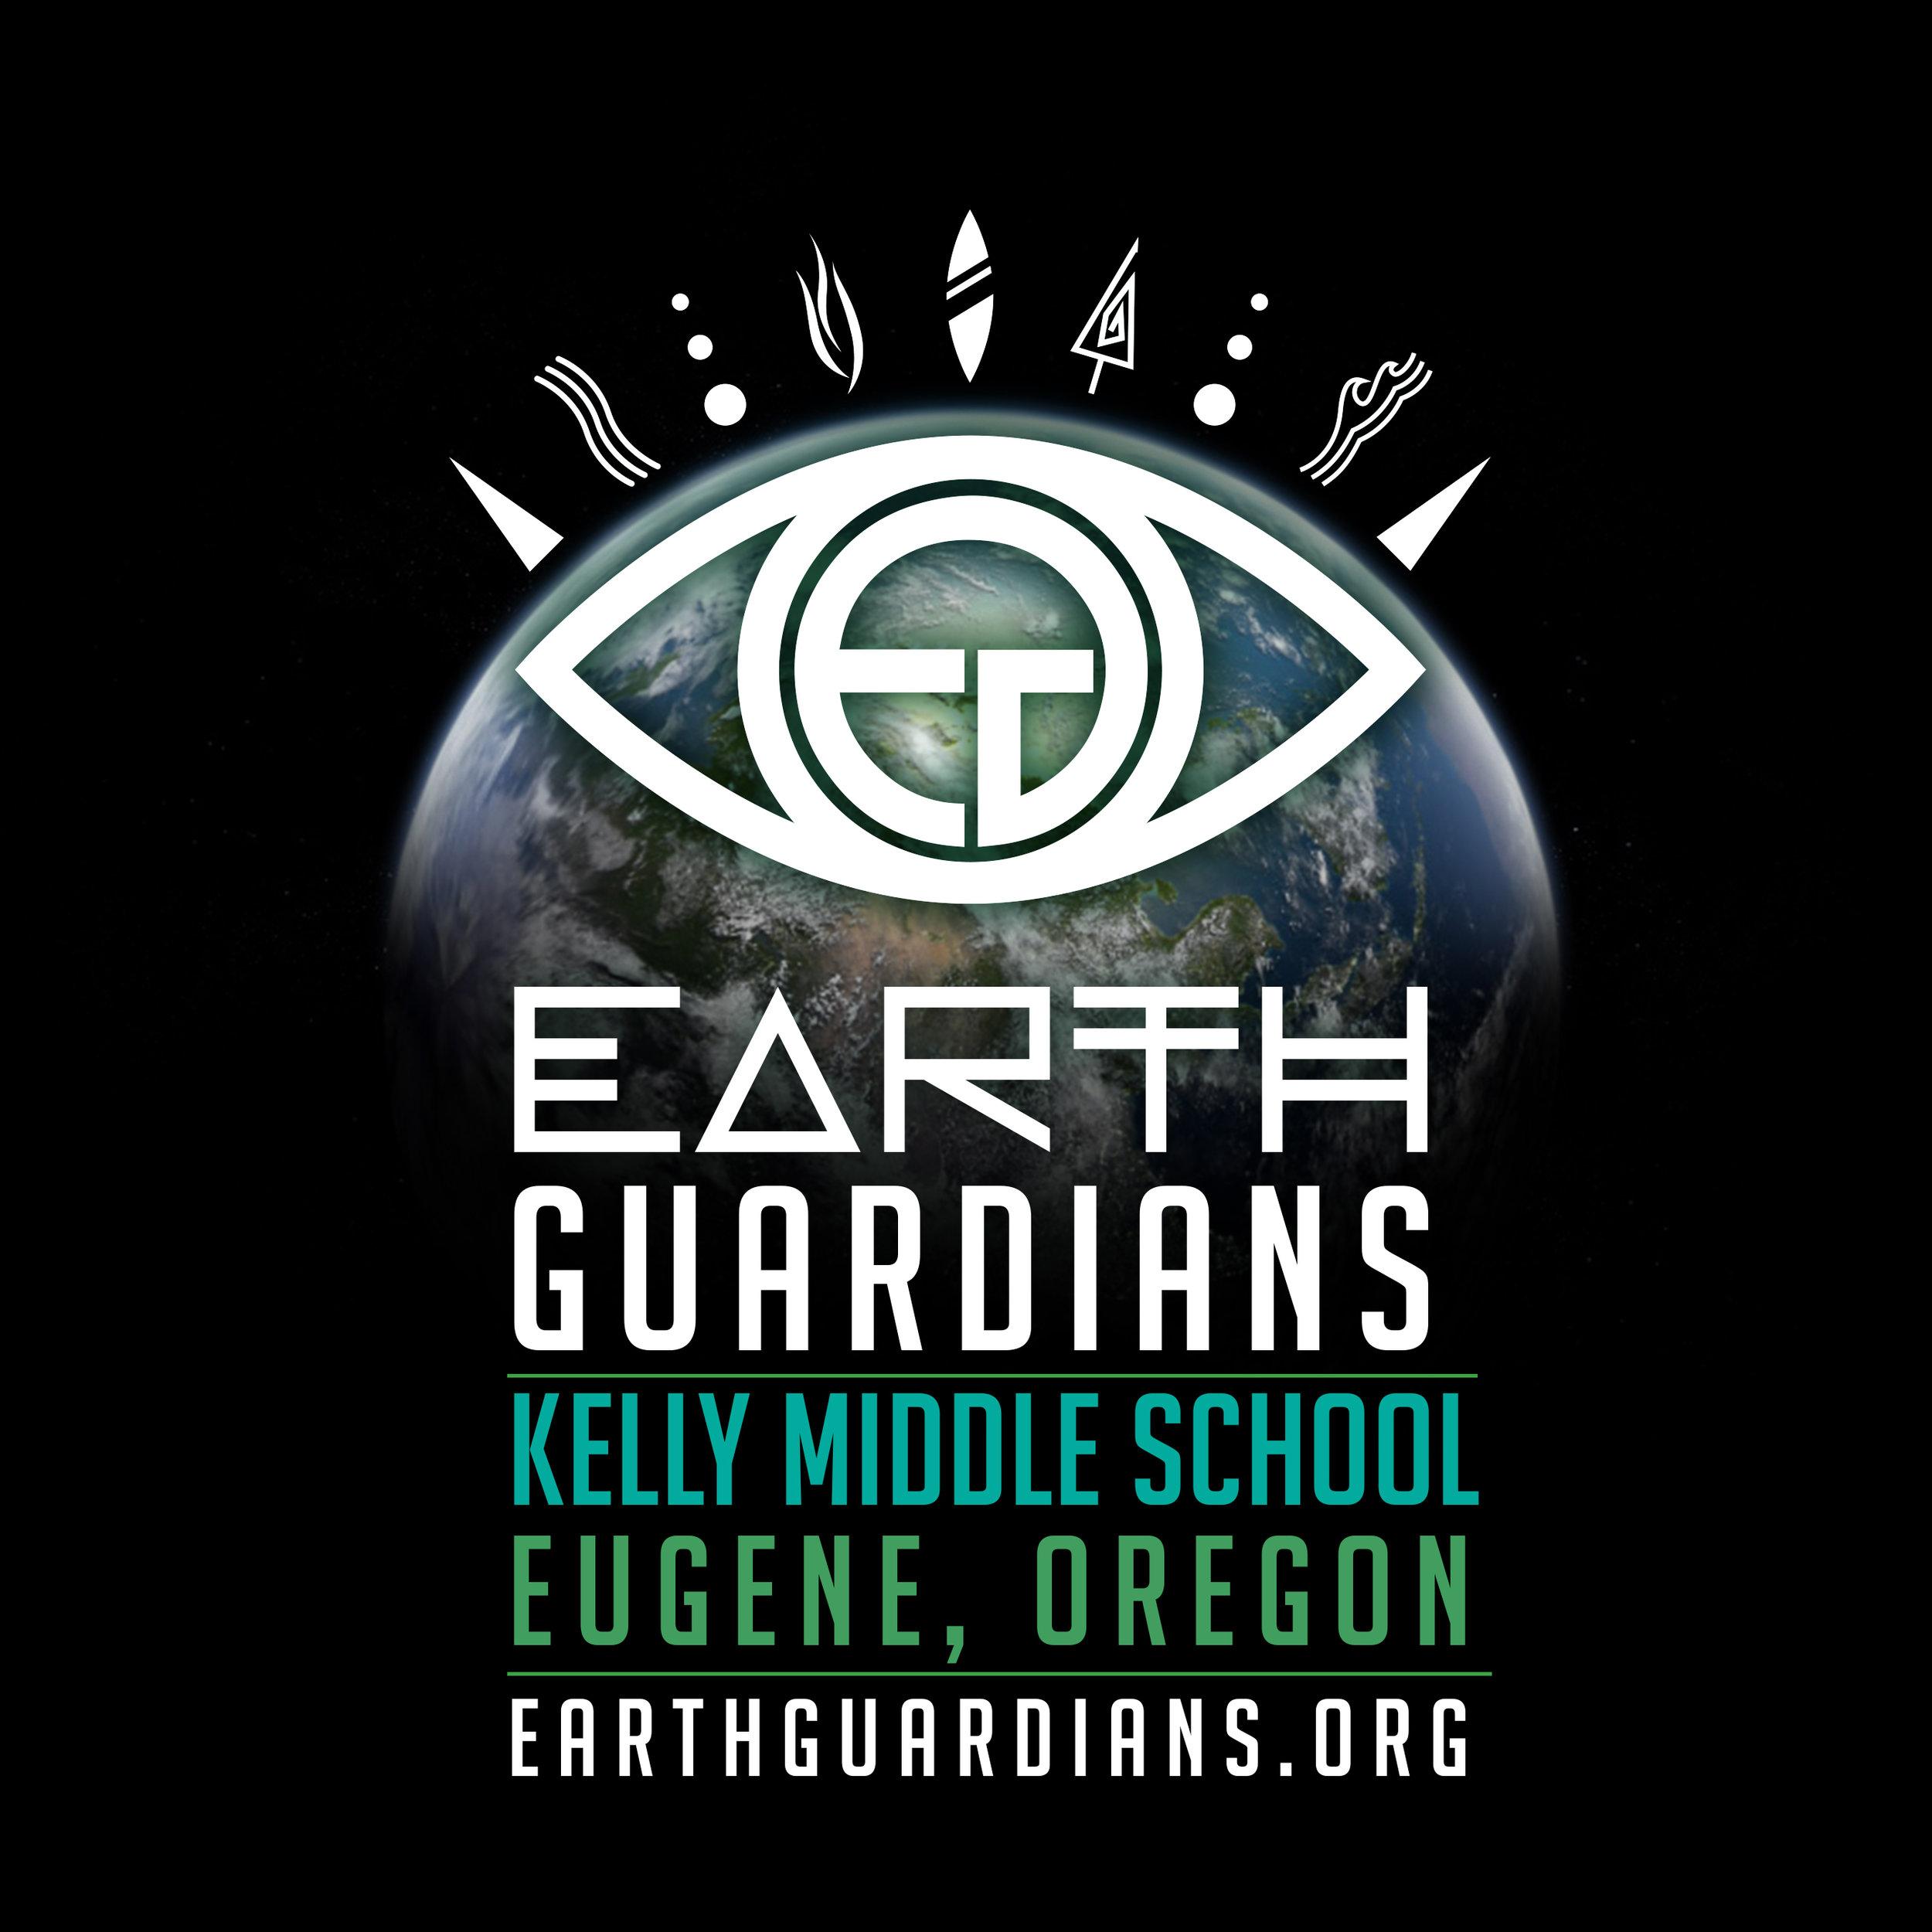 EG_Kelly middle school.jpg